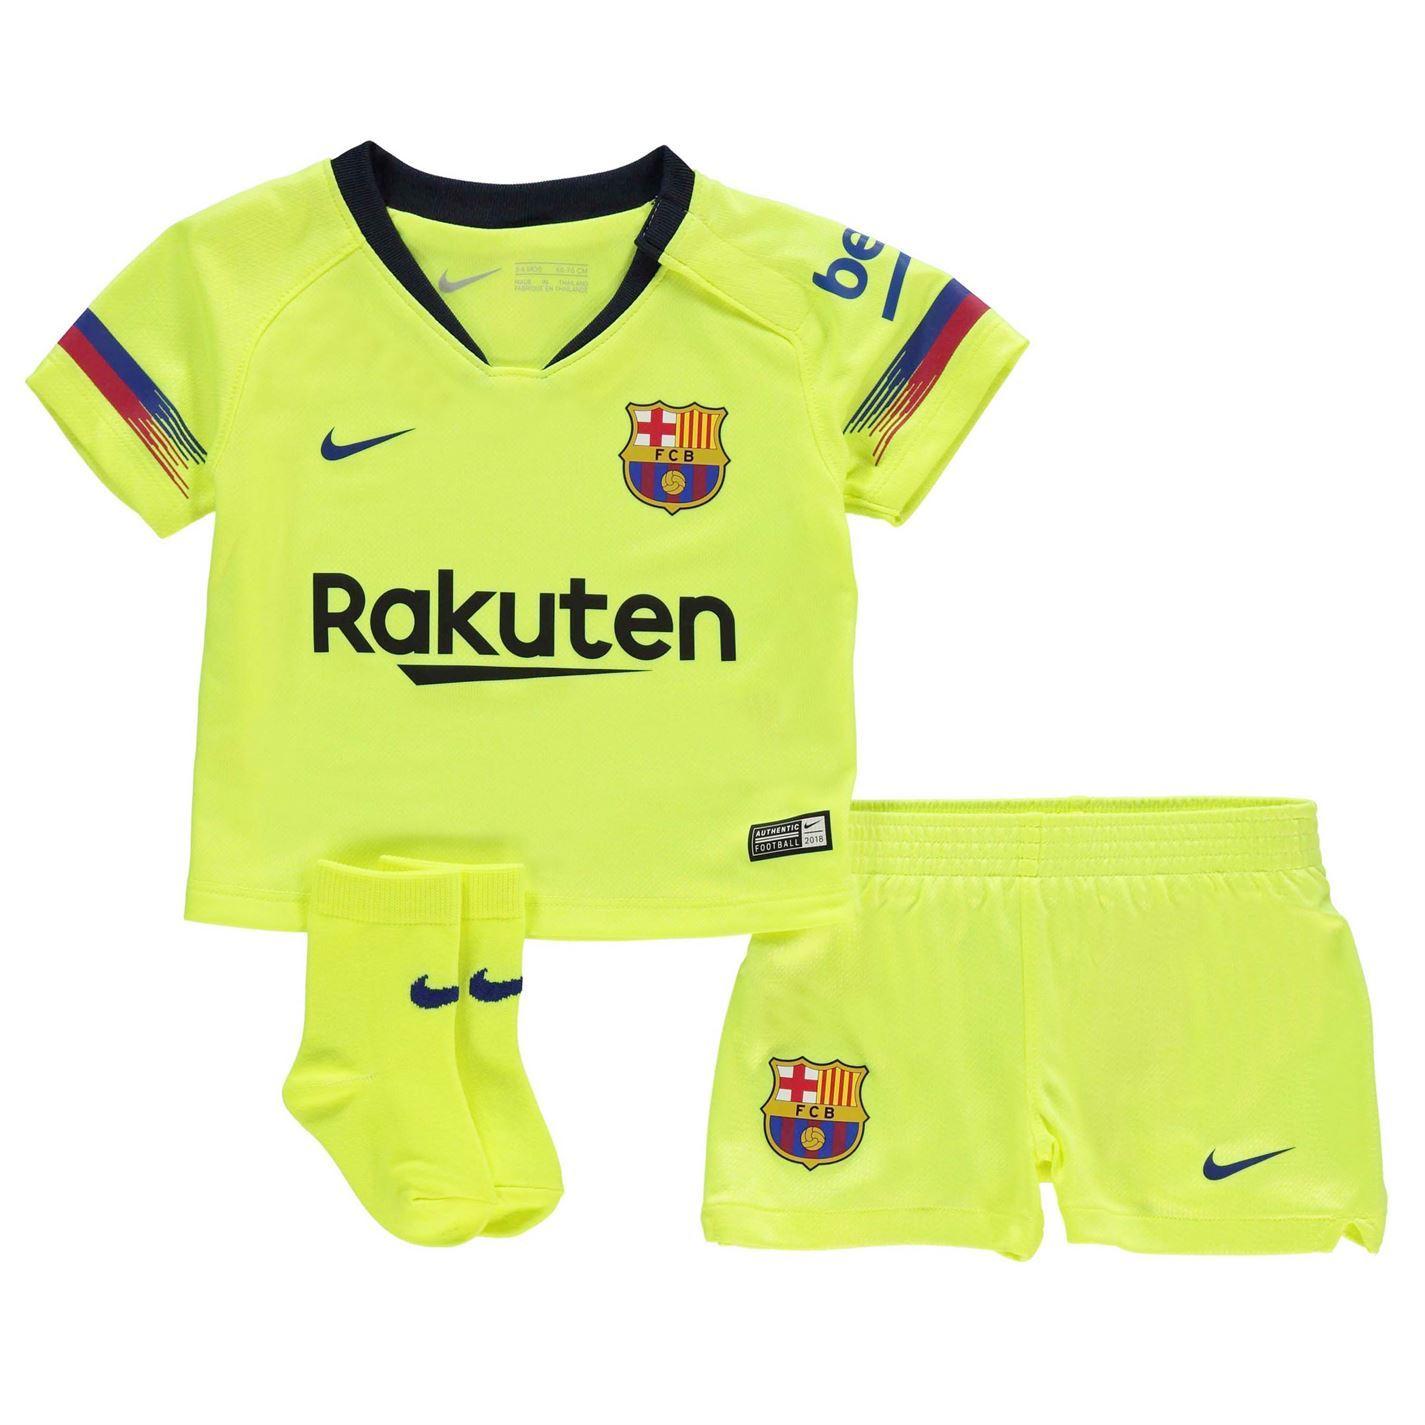 ... Nike Barcelona Away Baby Kit 2018 19 Infants Yellow Football Soccer  Strip ... 433e8906d6e